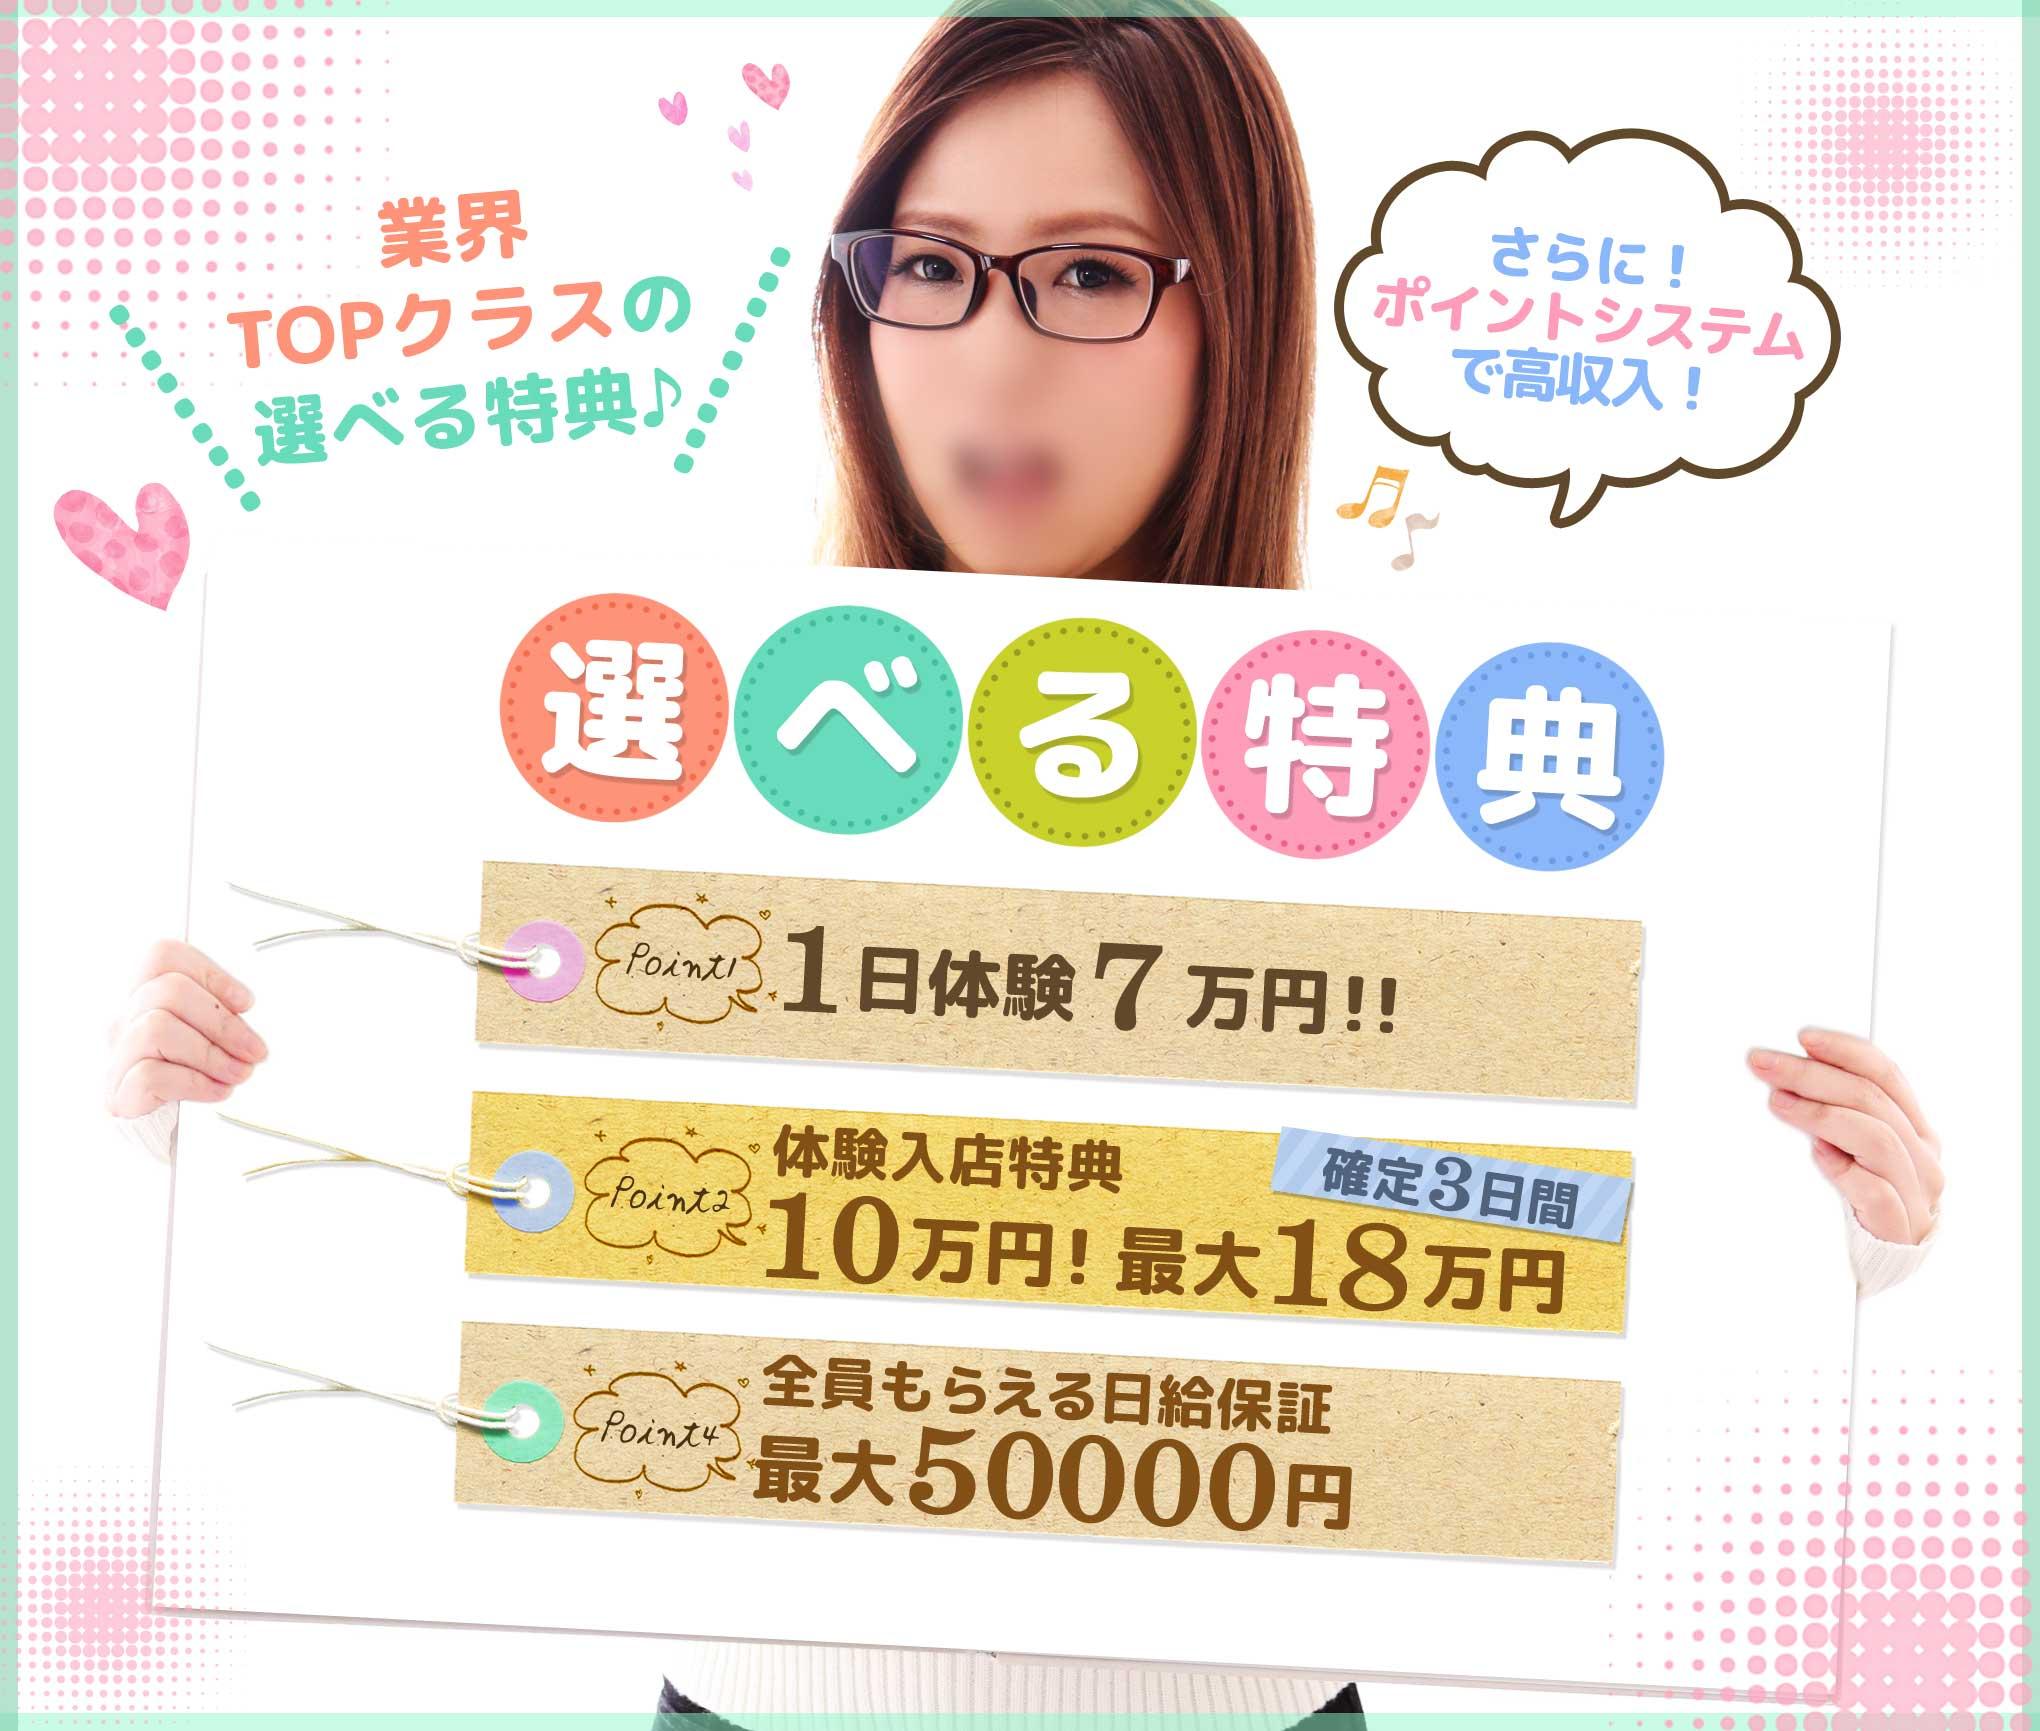 http://www.kyujin-yes.com/img/upd-img/sapporo/joyu/image_3133.jpg